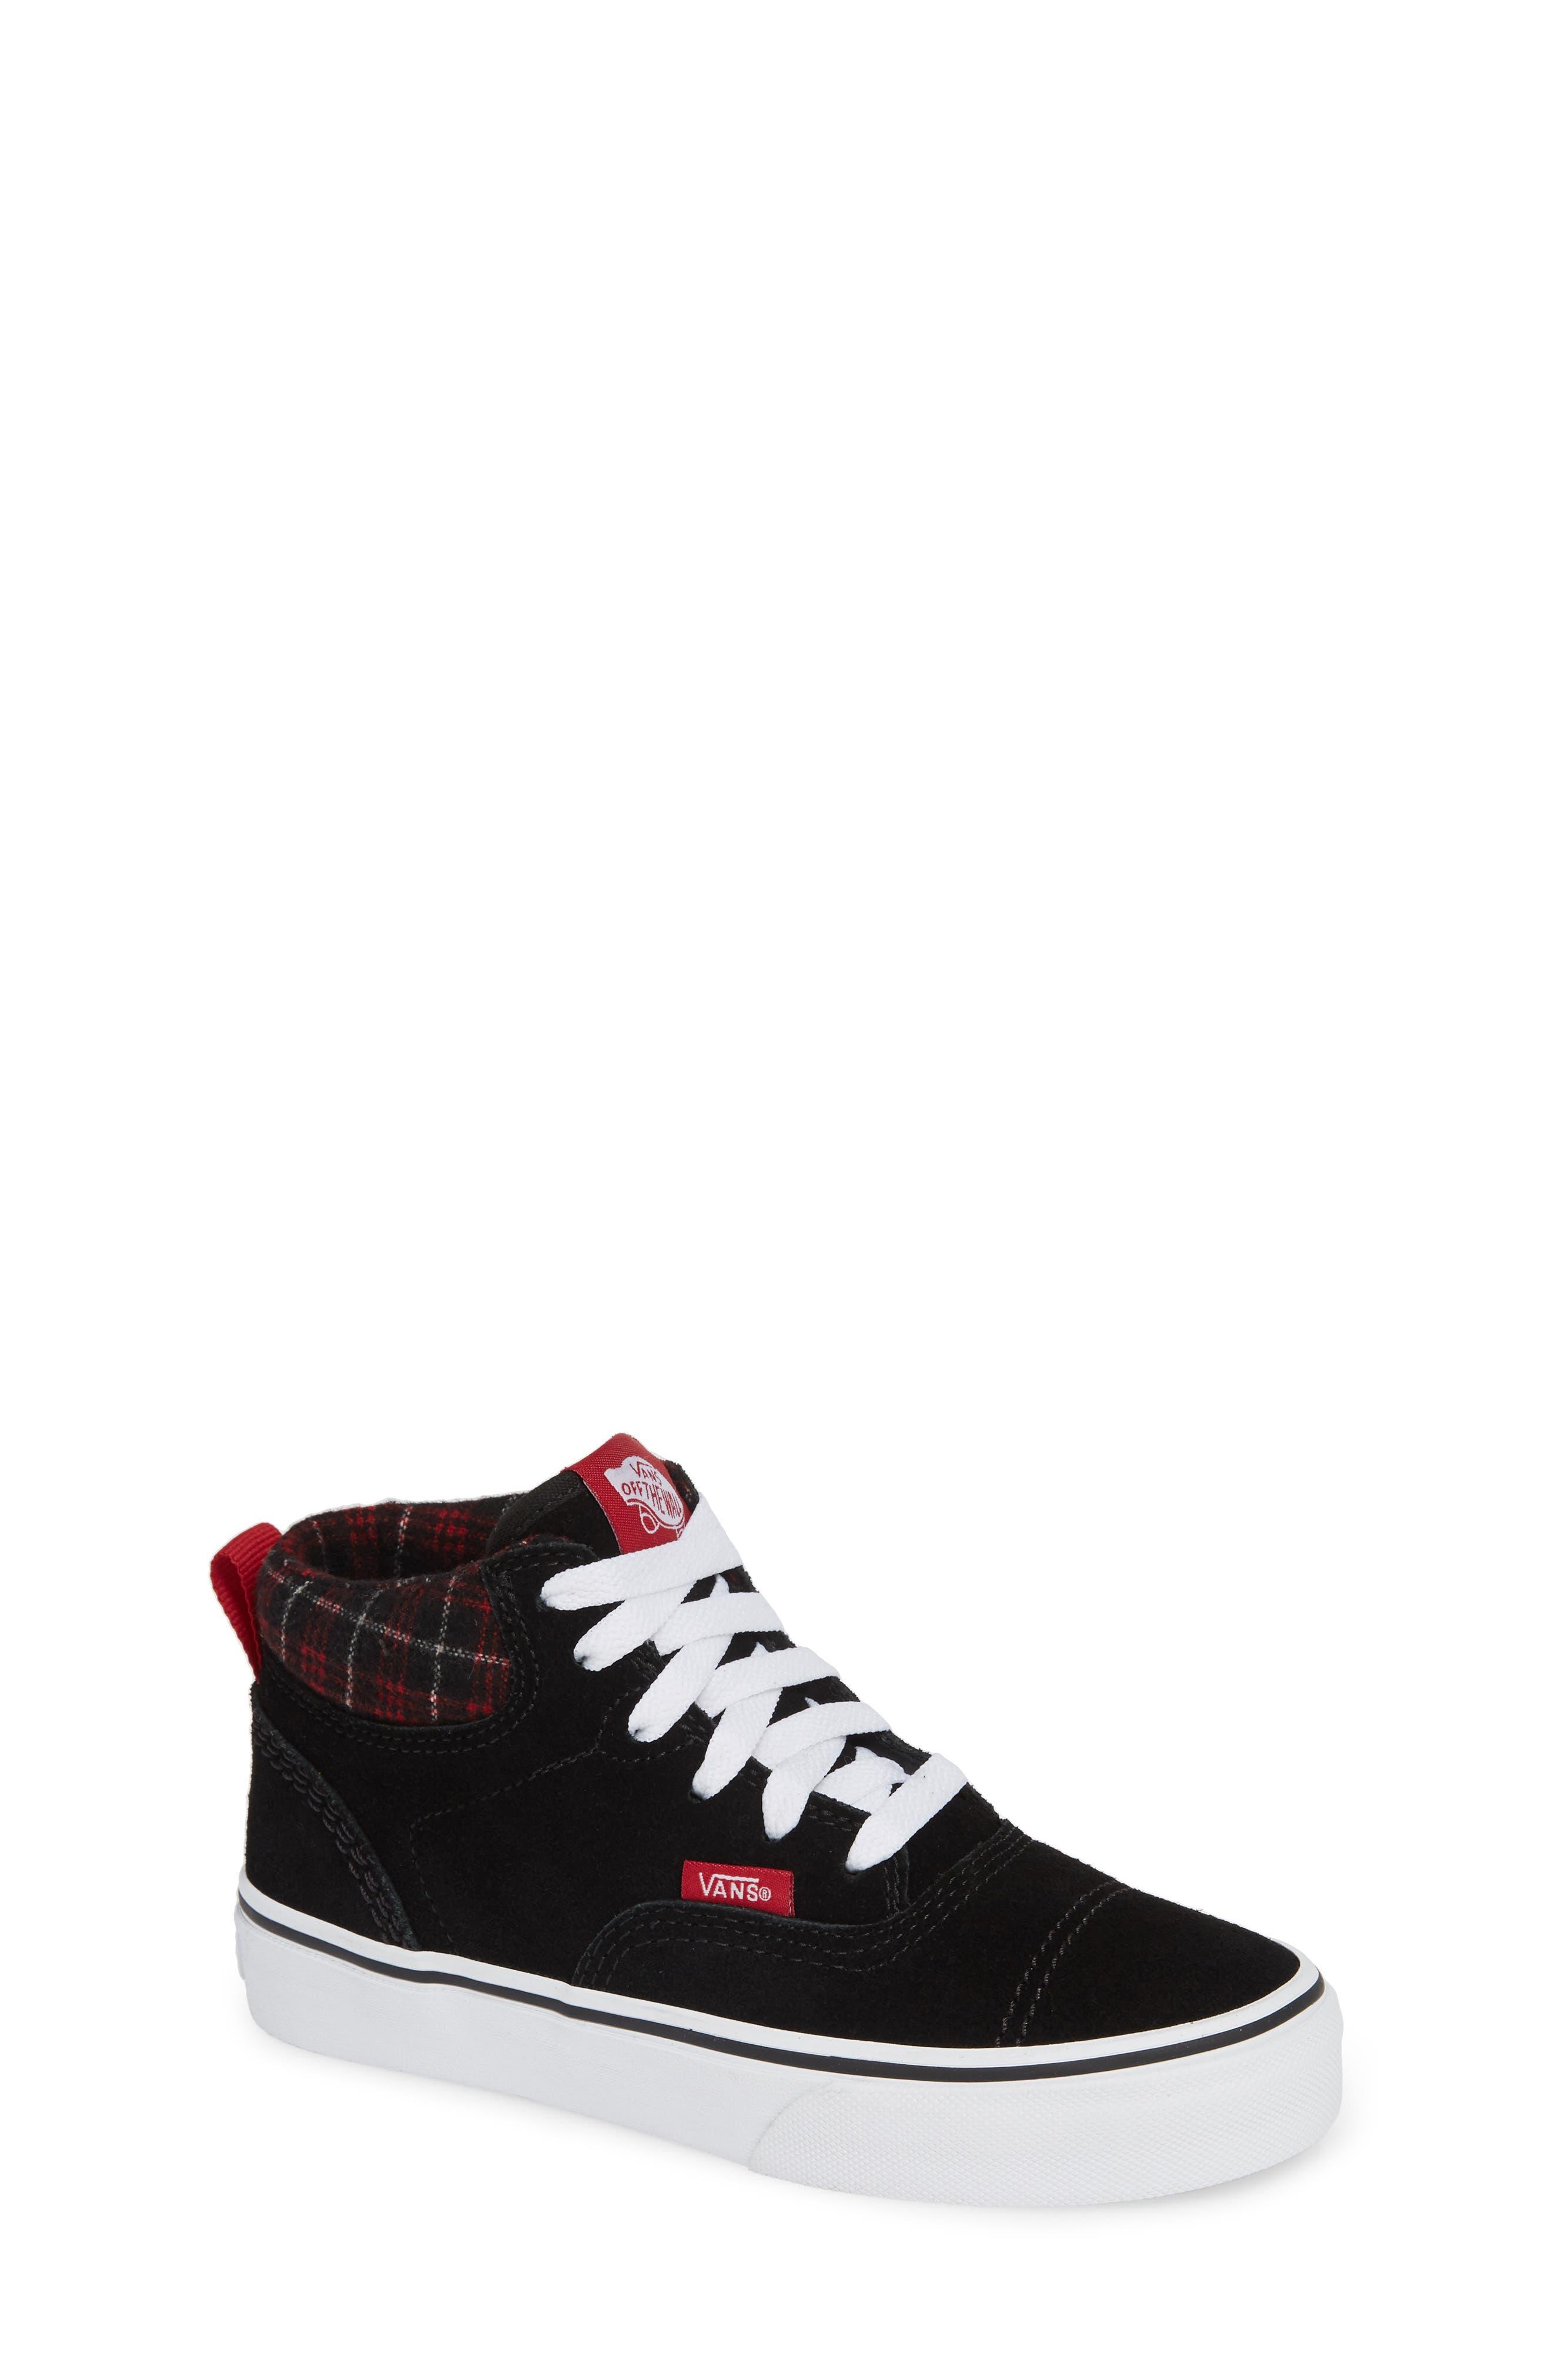 Era - Hi Sneaker,                         Main,                         color, SUEDE AND PLAID BLACK/ WHITE